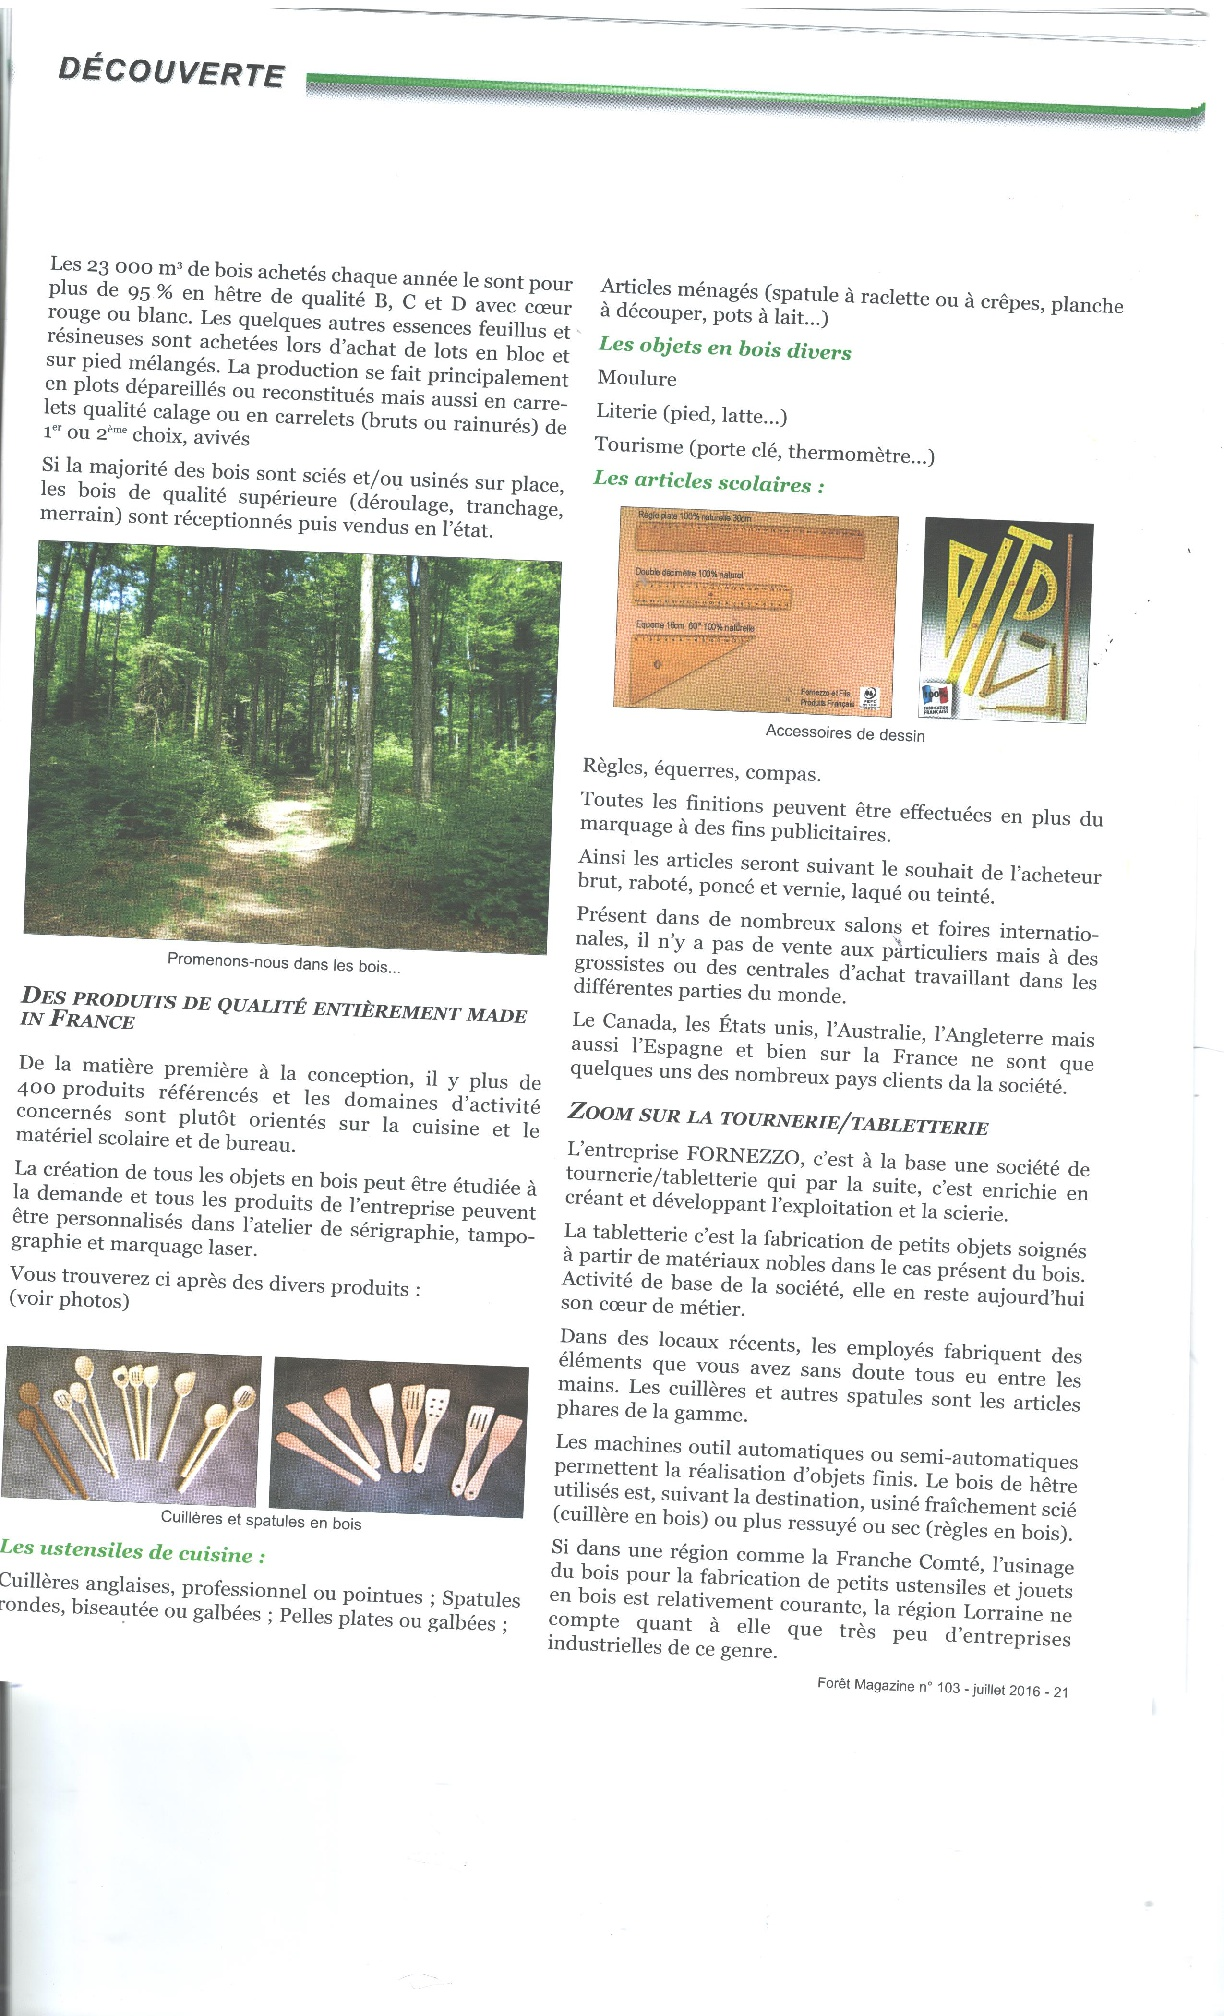 Foret magazine p2